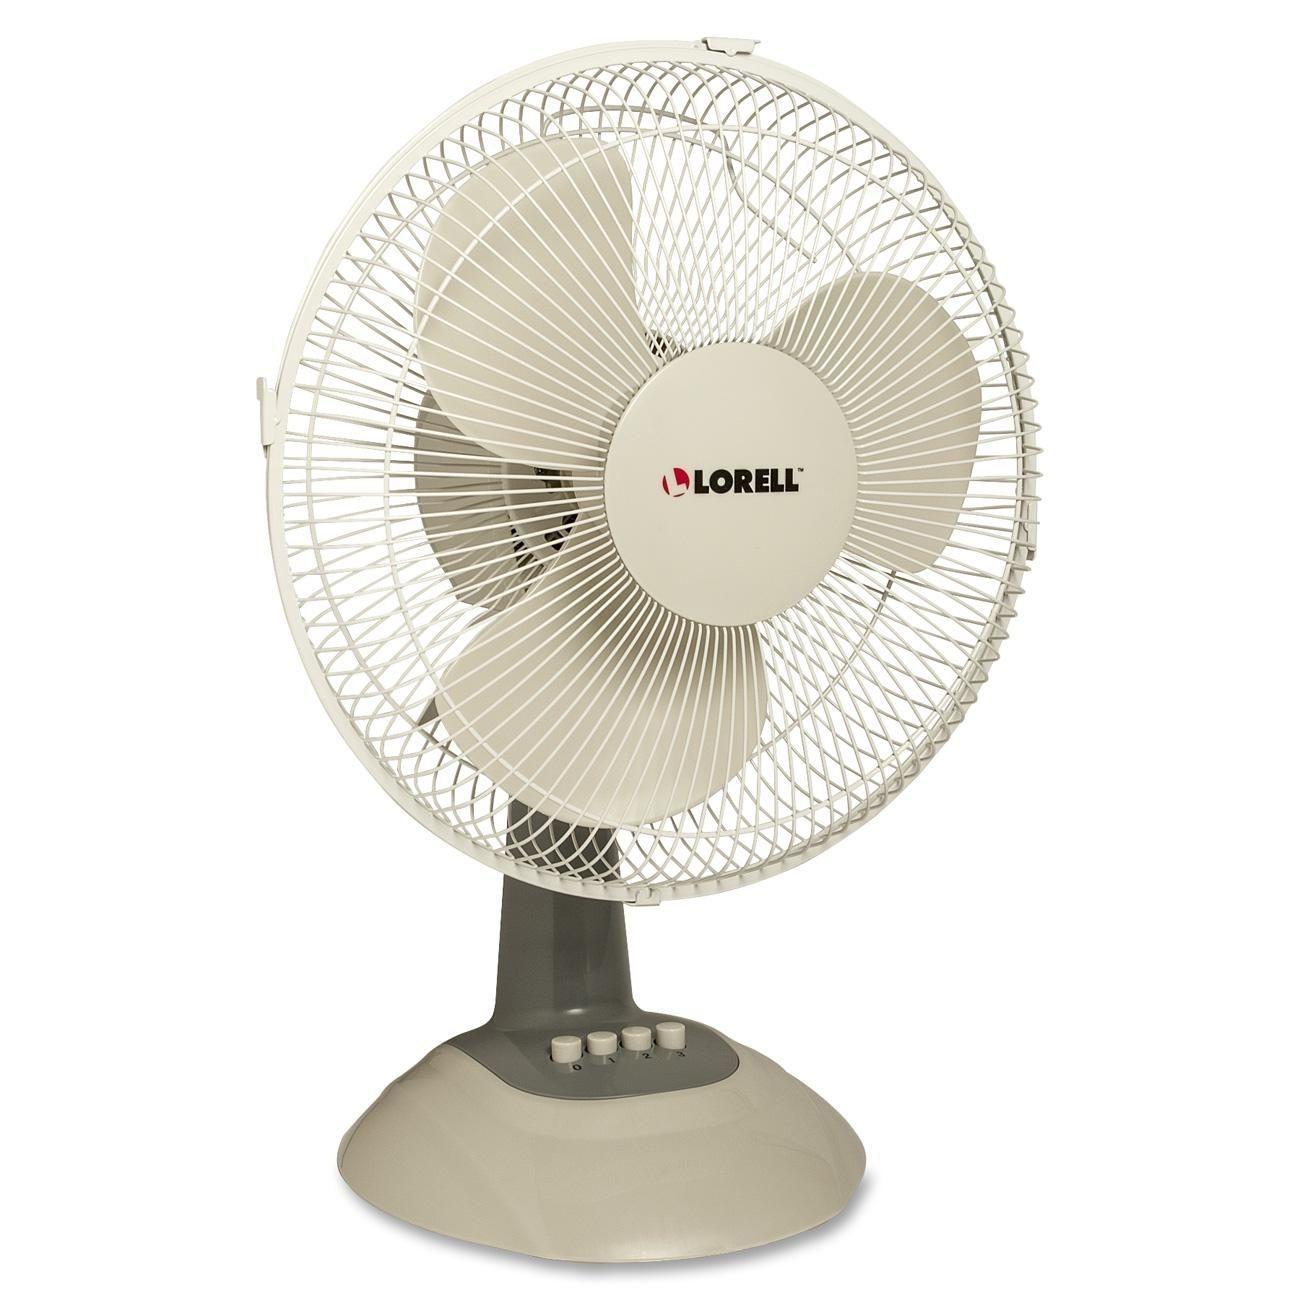 Windmere 7 Oscillating Fan : Small oscillating desk fan vintage windmere quot